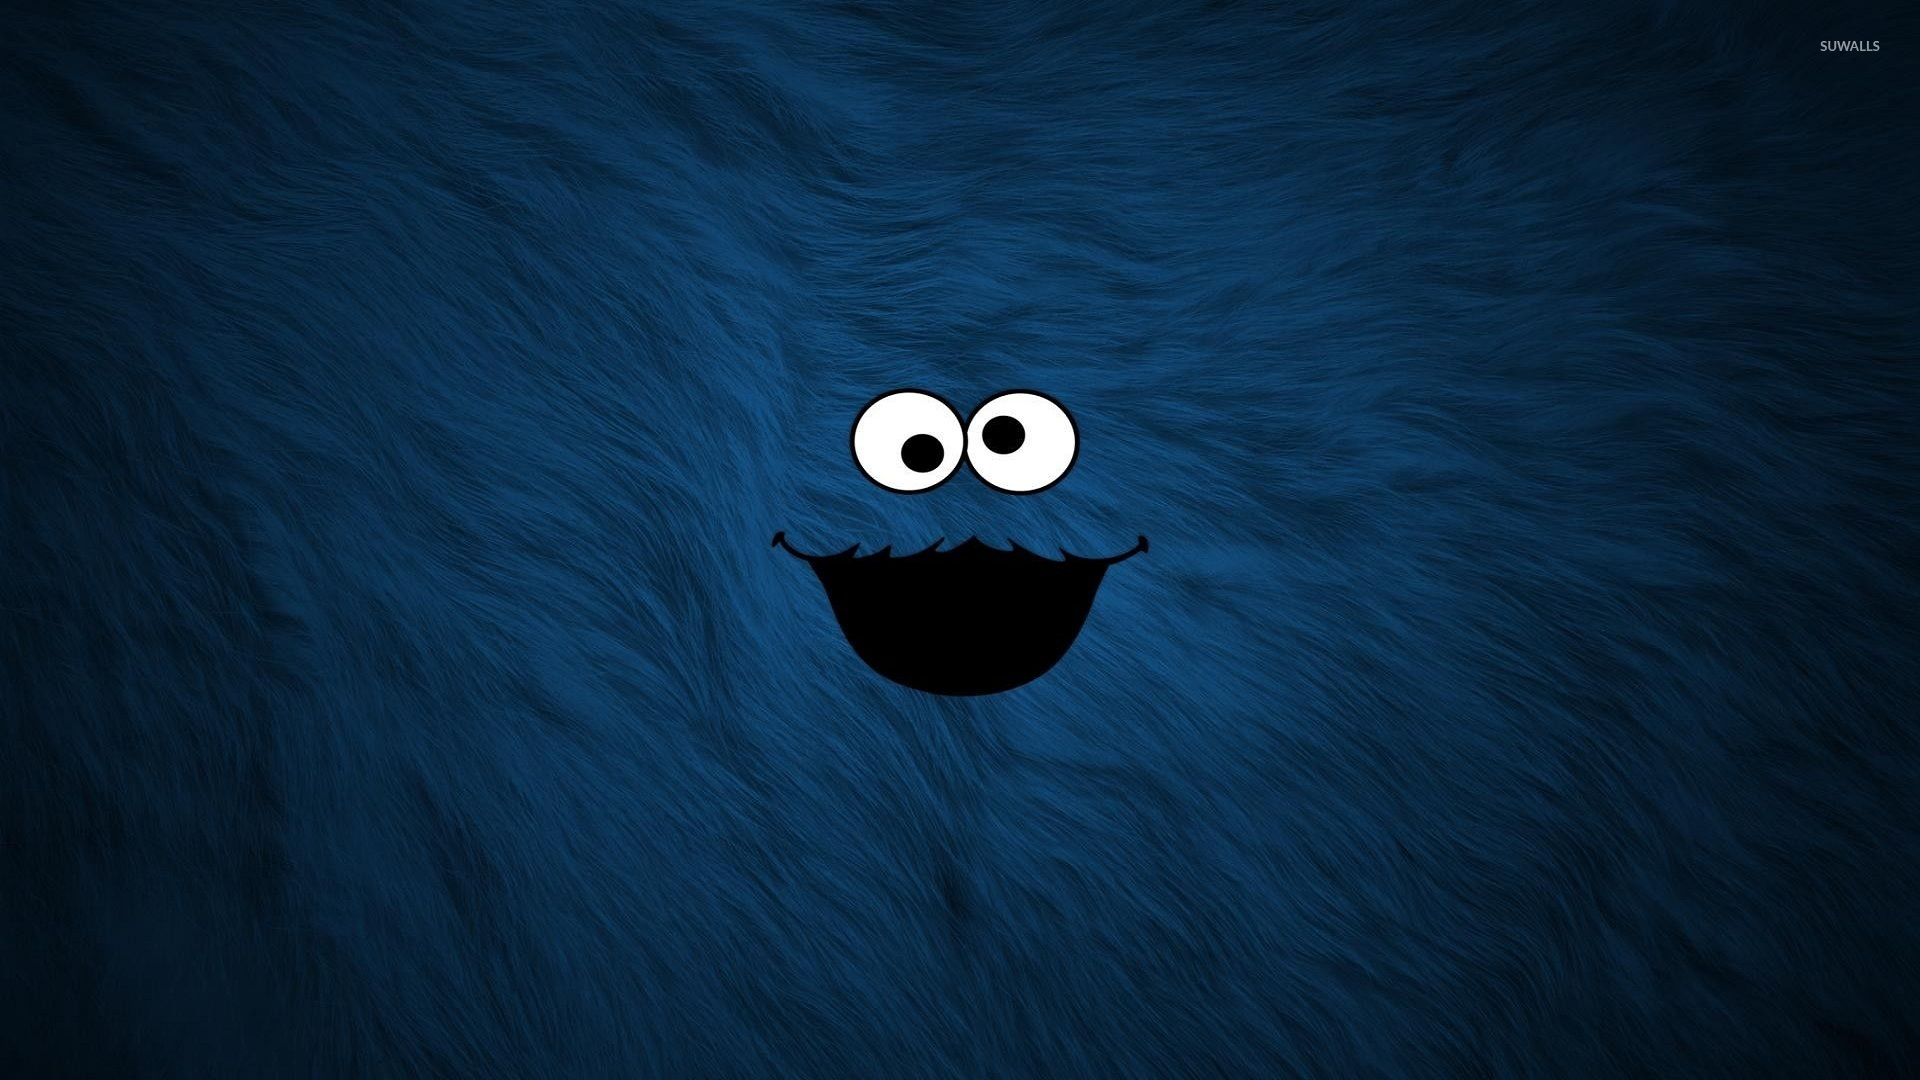 Cookie Monster From Sesame Street Wallpaper